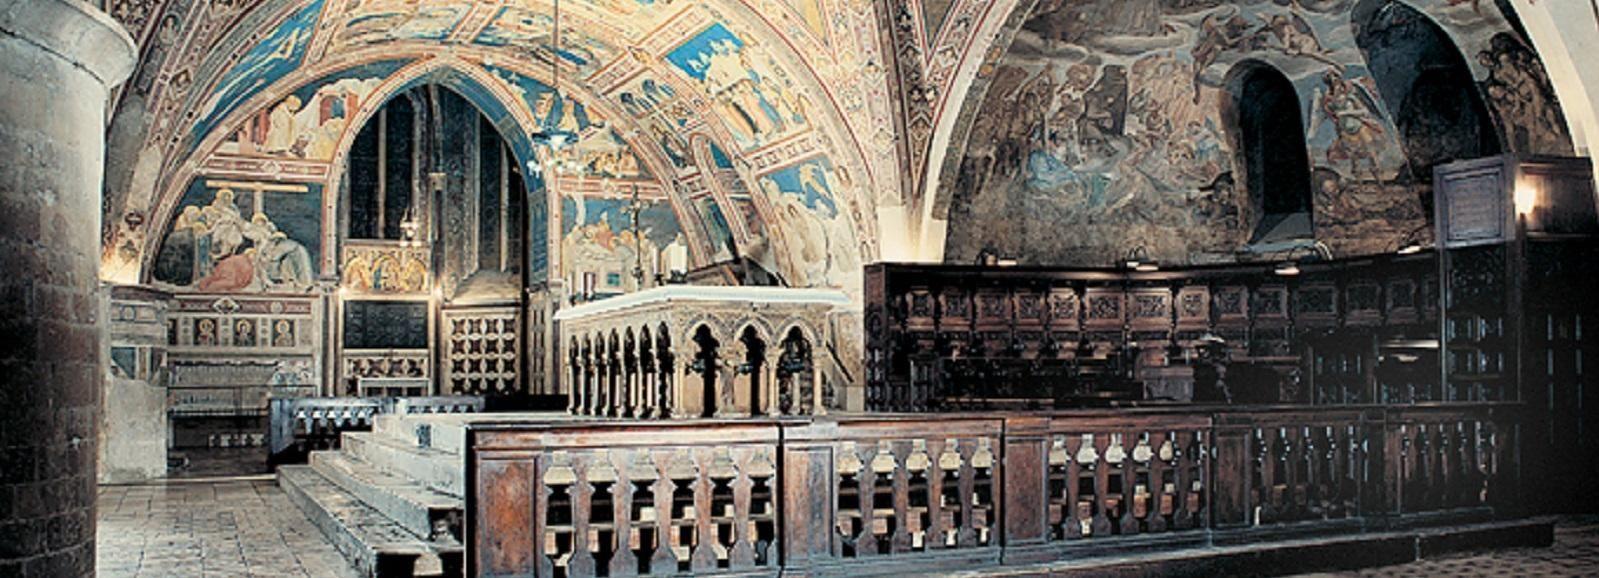 Assisi: Basilika des Heiligen Franziskus Tour